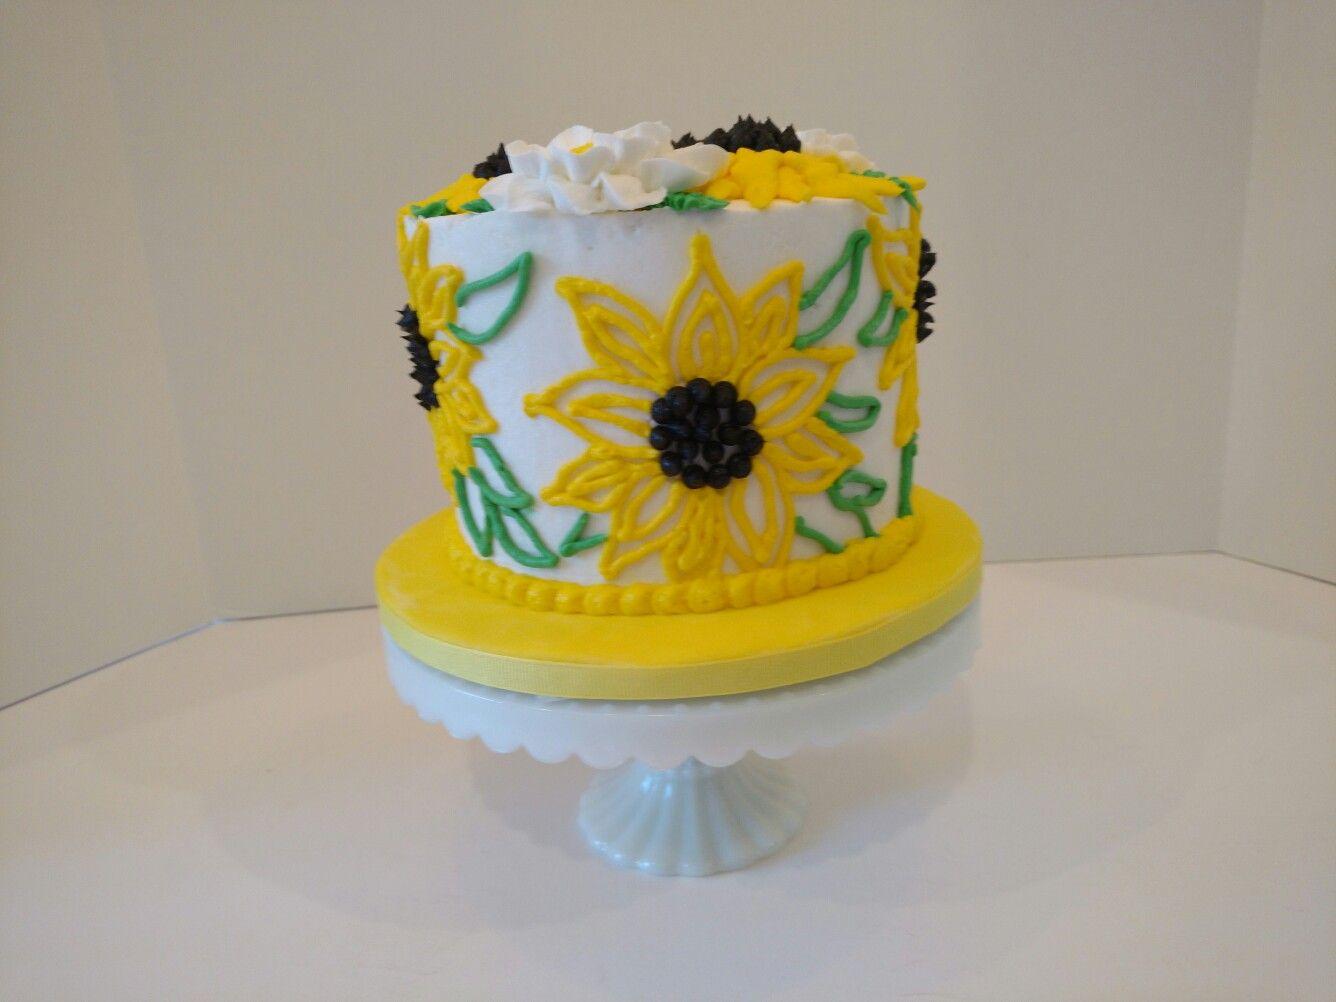 Sunflower Smash Cake